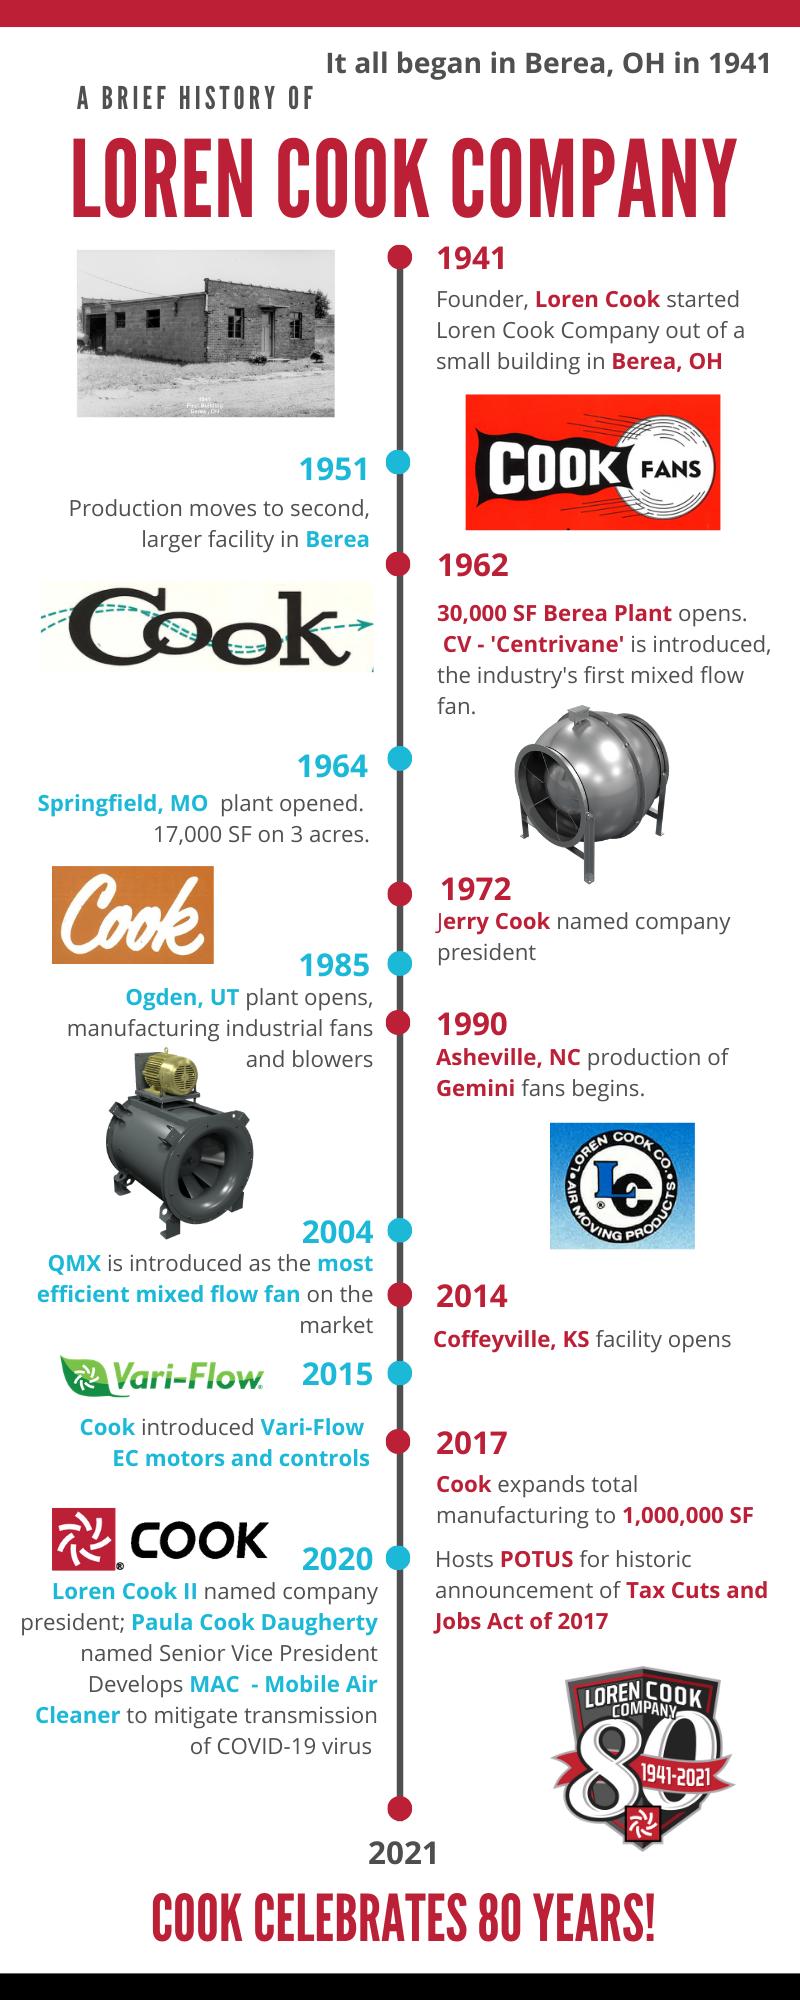 Loren Cook Company Timeline